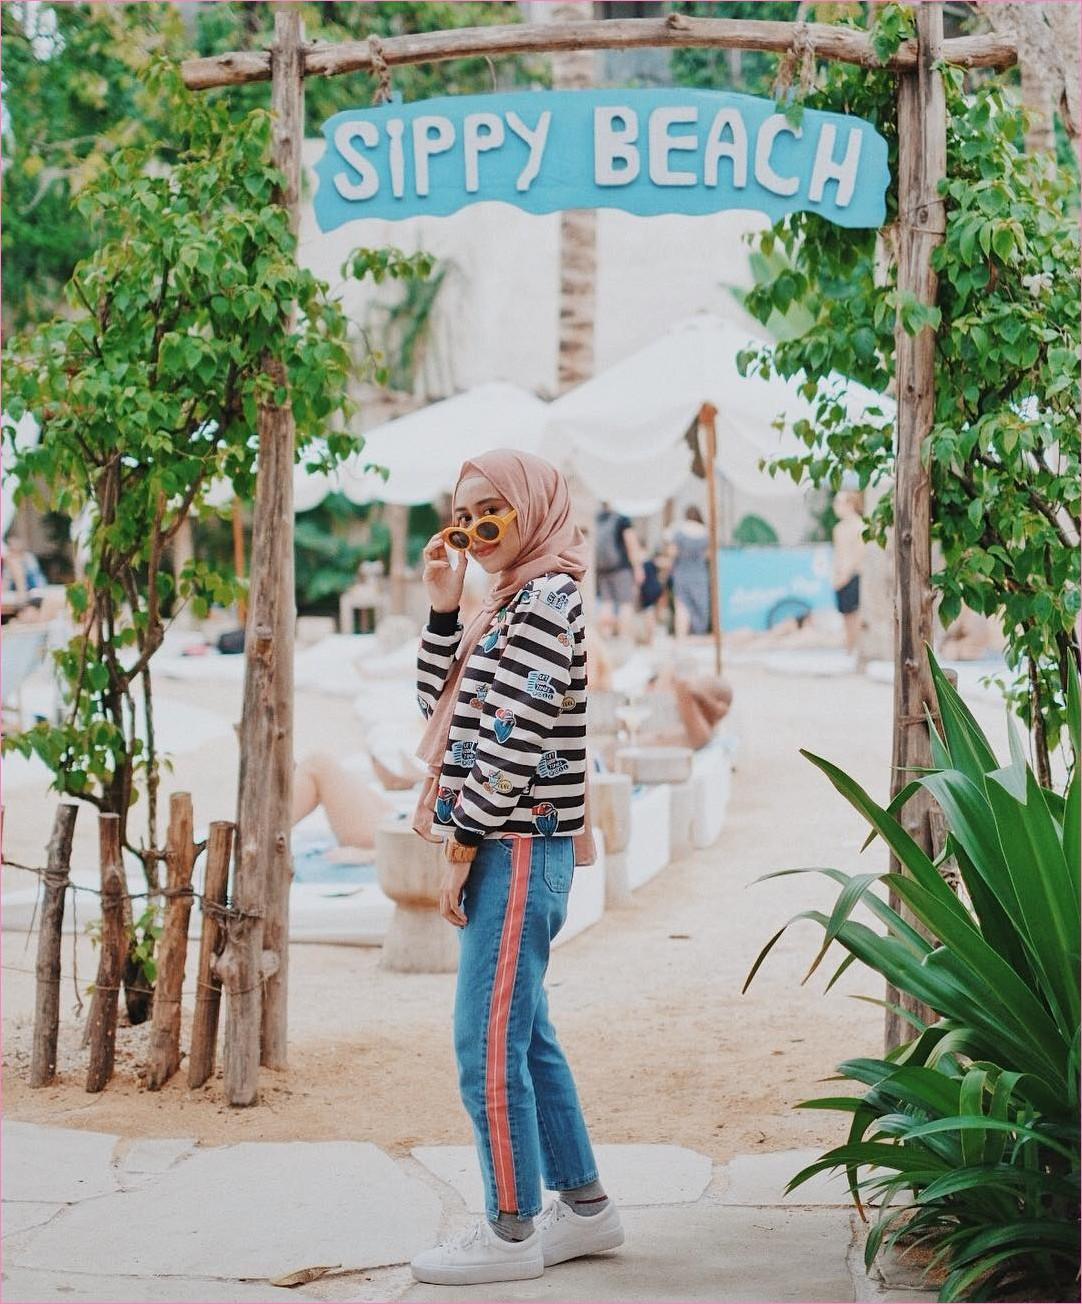 Outfit Celana Jeans Untuk Hijabers Ala Selebgram 2018 sweaters stripe putih hitam hijab pashmina diamond krem pants jeans denim ciput rajut sneakers kets putih jam tangan krem kacamata oren muda kaos kaki abu ootd trendy